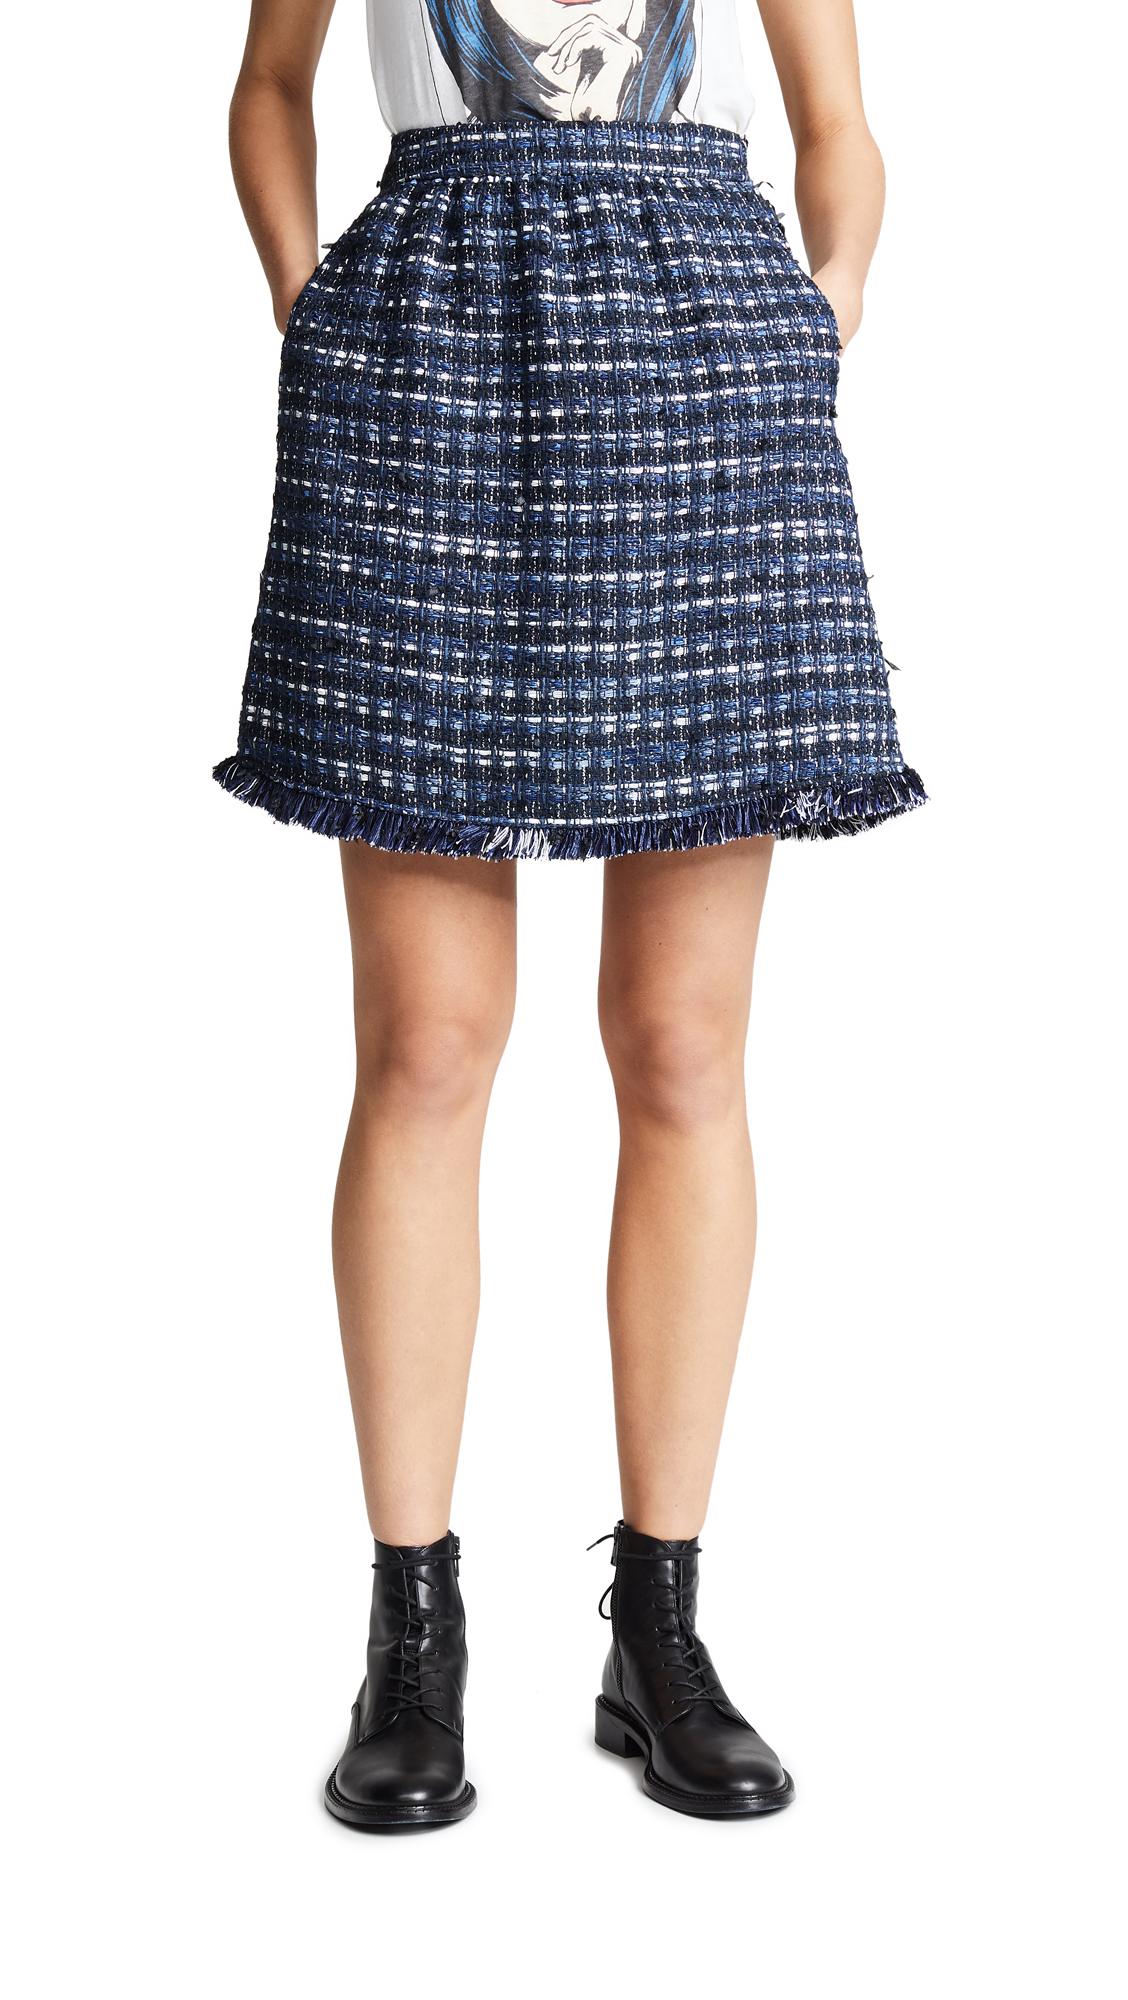 Boutique Moschino Tweed Skirt - Blue Tweed